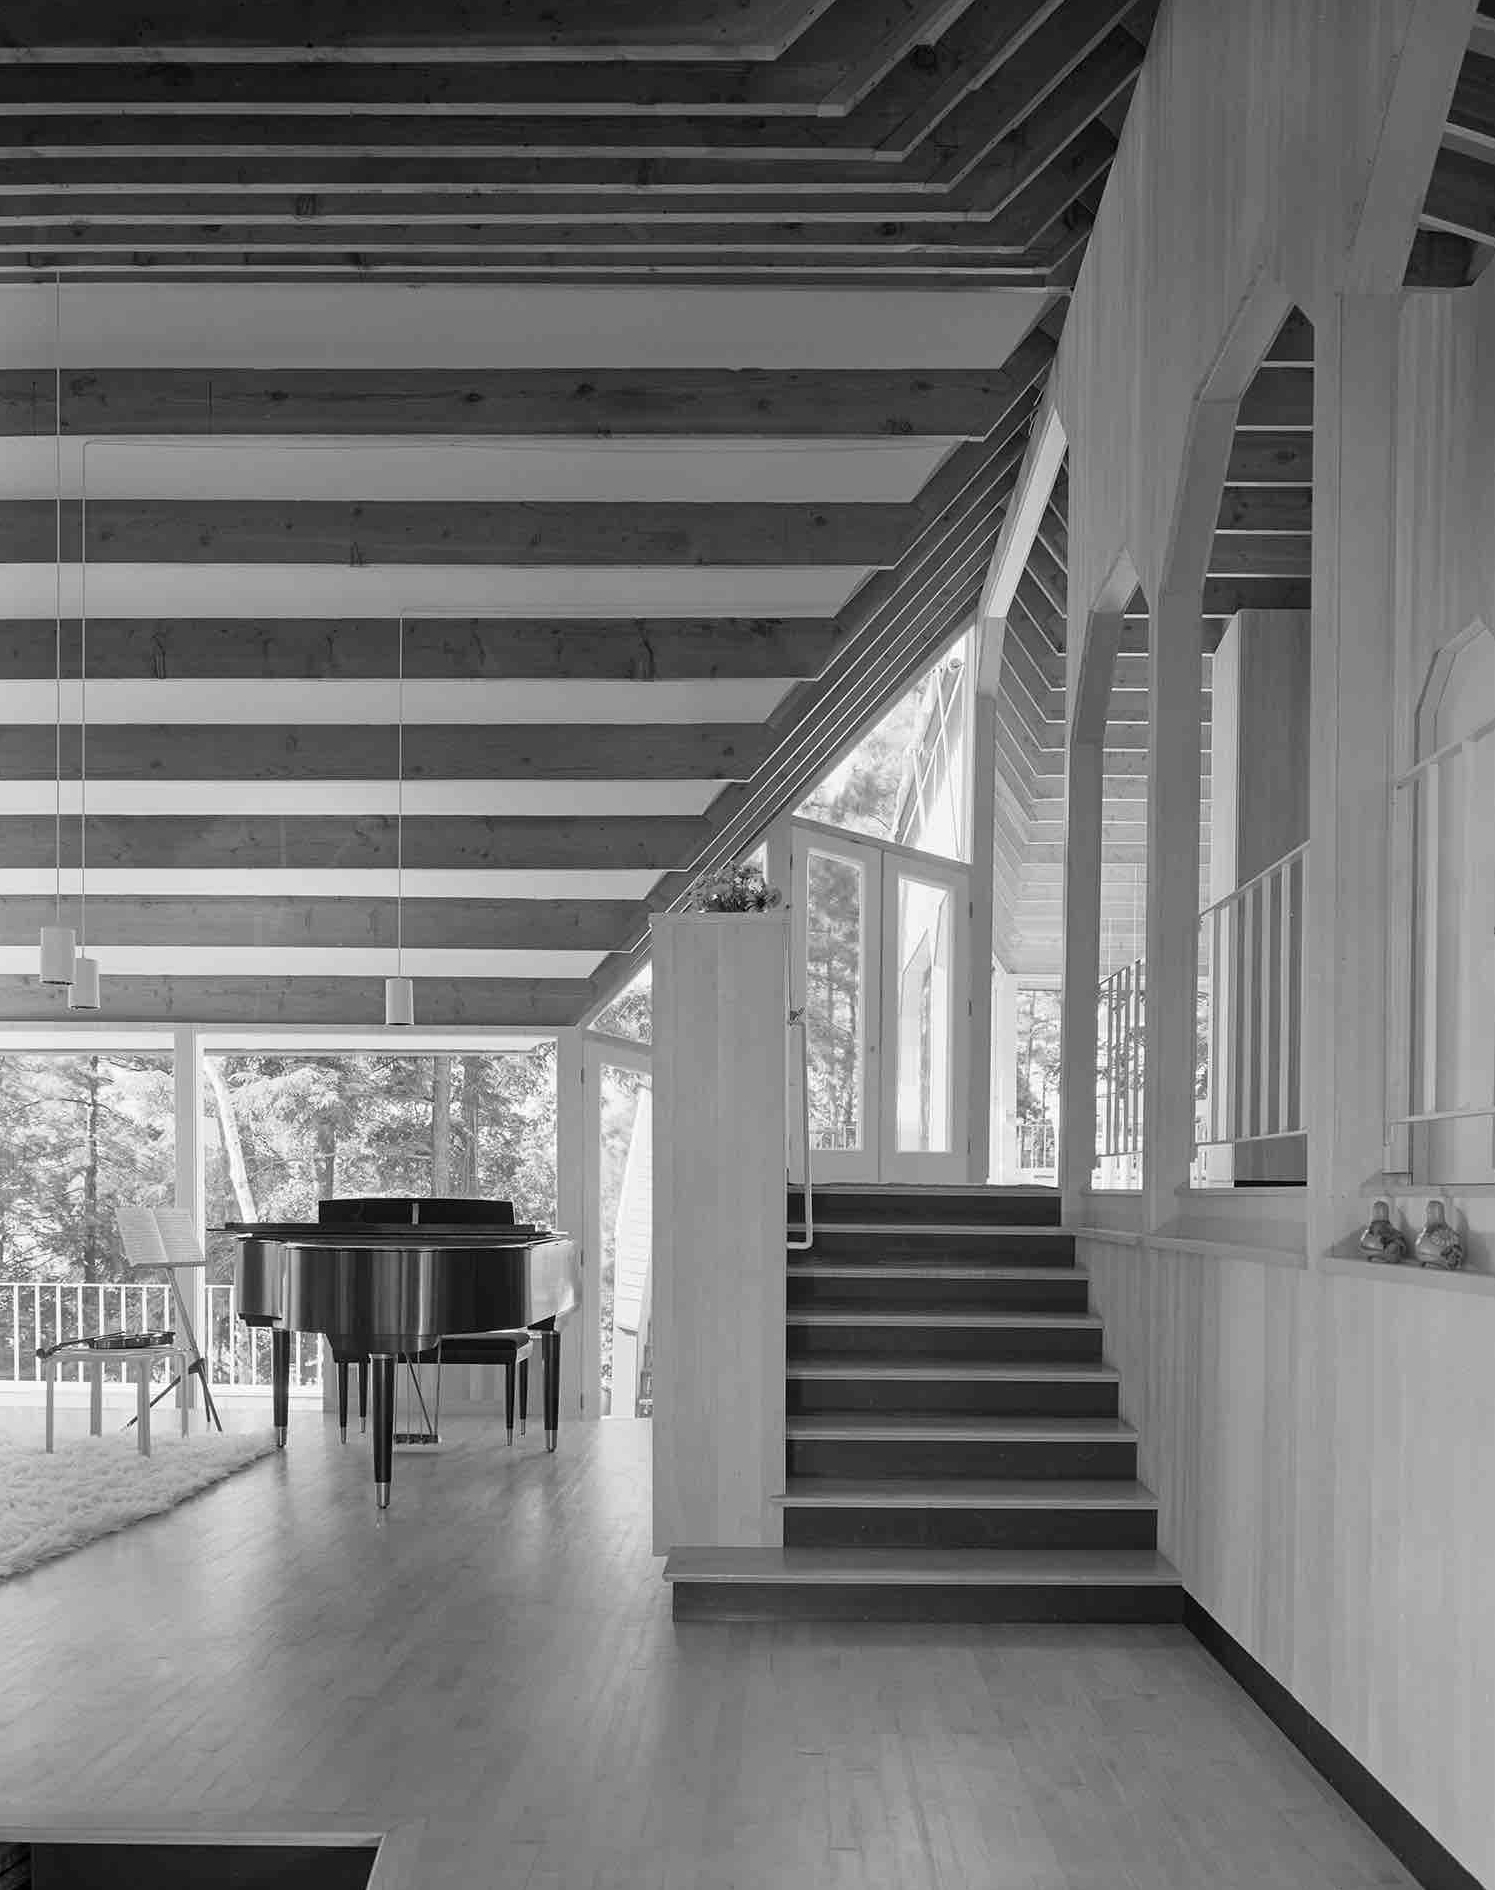 S.O.M.,Tangerman Summer House (Lake Rousseau, Canada) 1965.